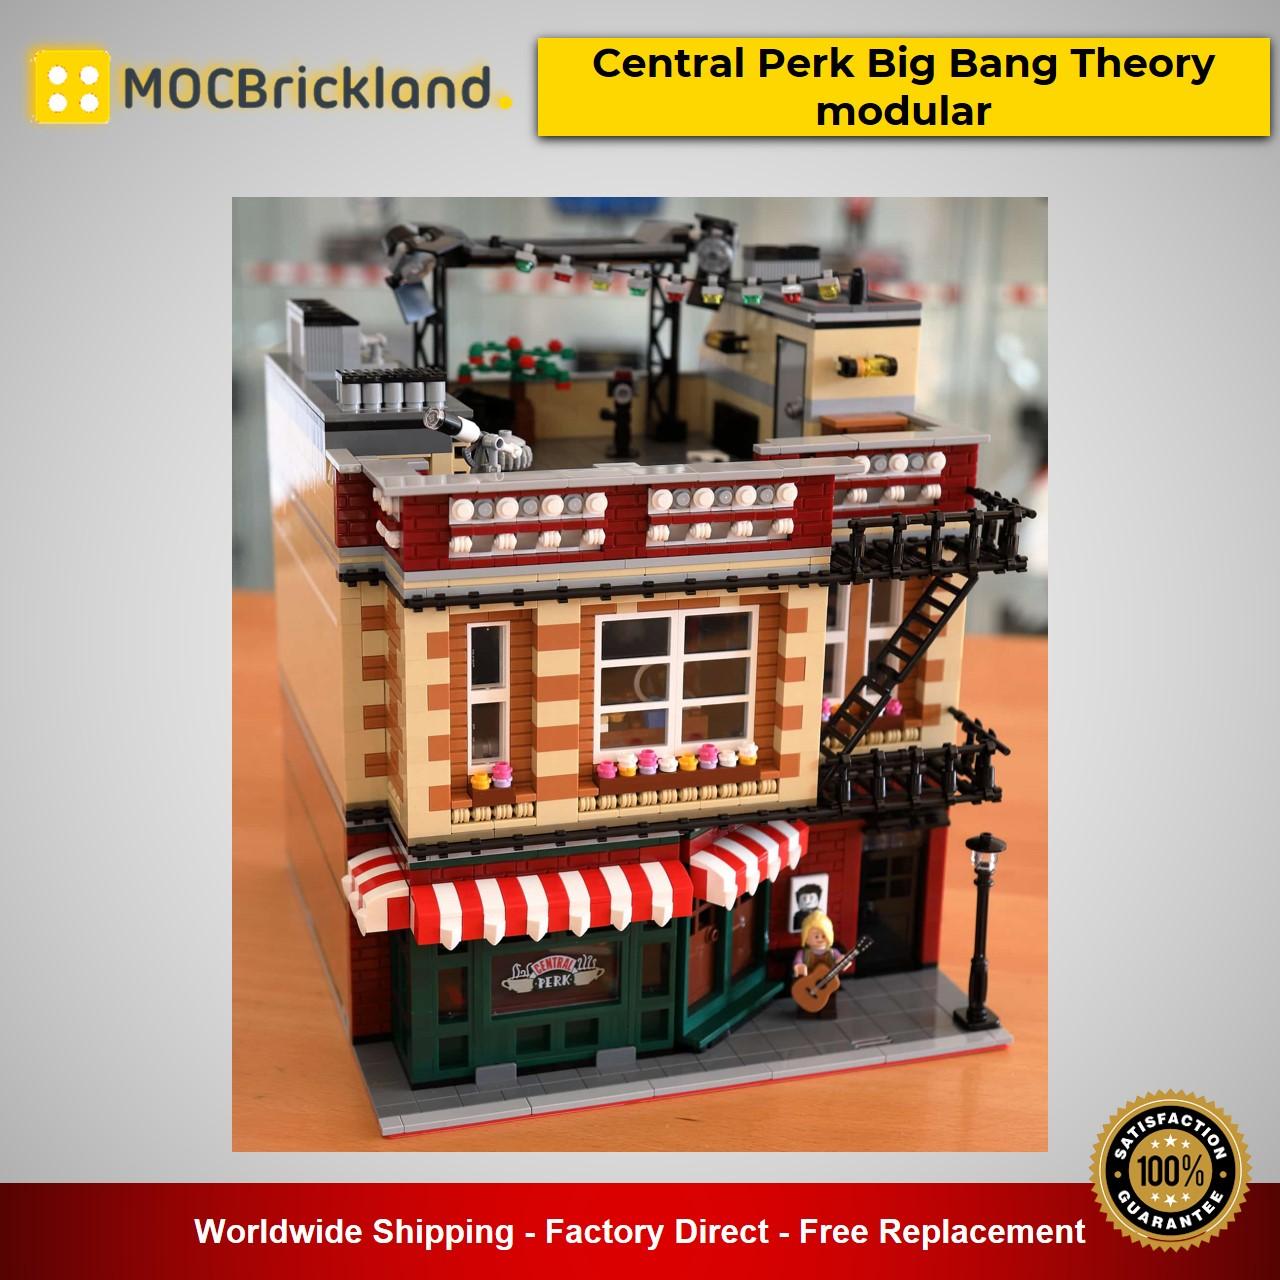 Modular Buildings MOC-34463 Central Perk Big Bang Theory modular Designed By BrickPolis With 4294 Pieces